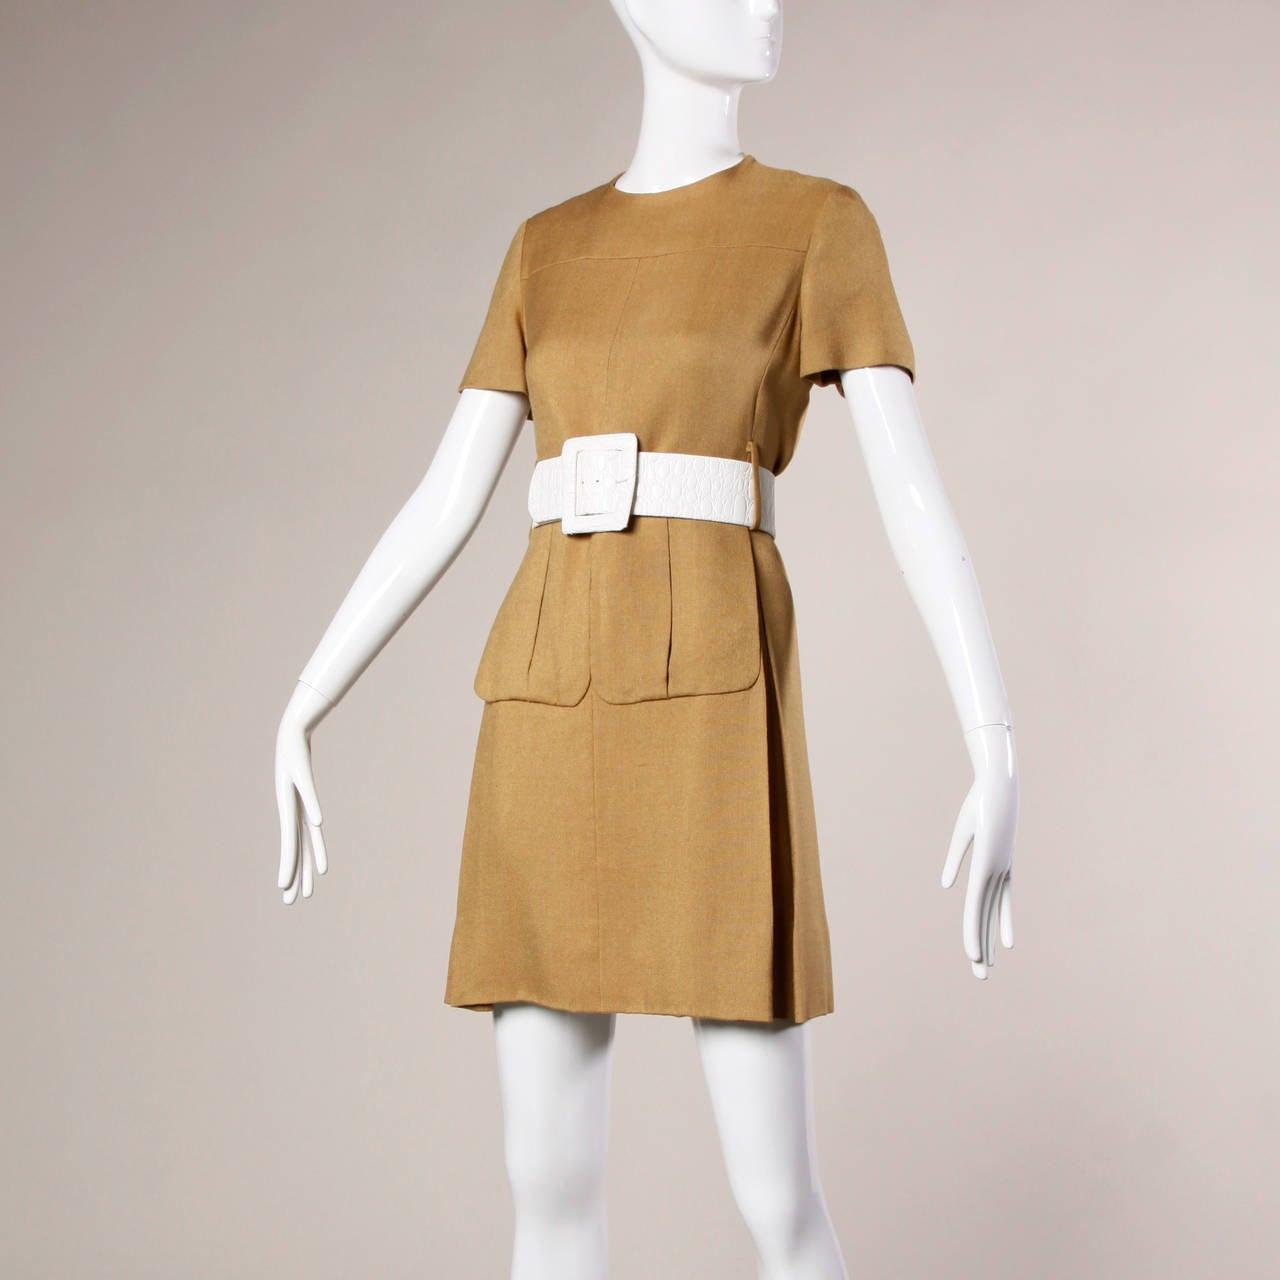 Women's Donald Brooks 1960s Mod Vintage Camel Linen + Silk Dress with Belt For Sale